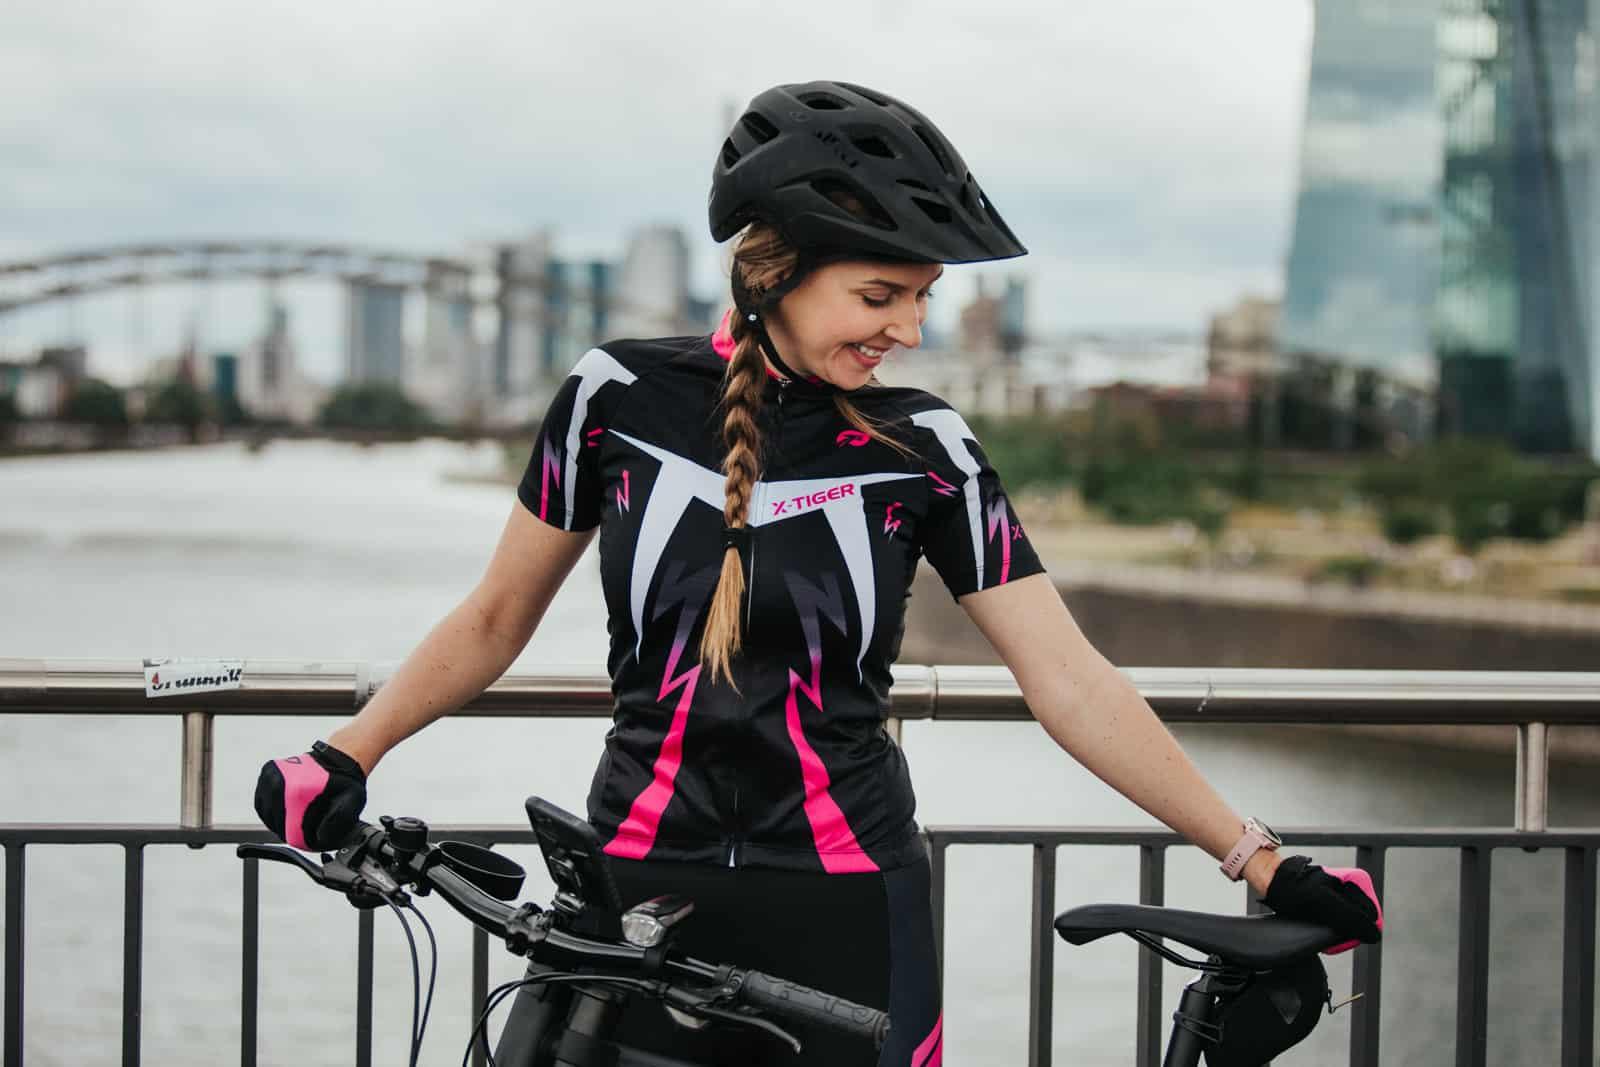 Frau hält ihr Cannondale Fahrrad fest in Frankfurt